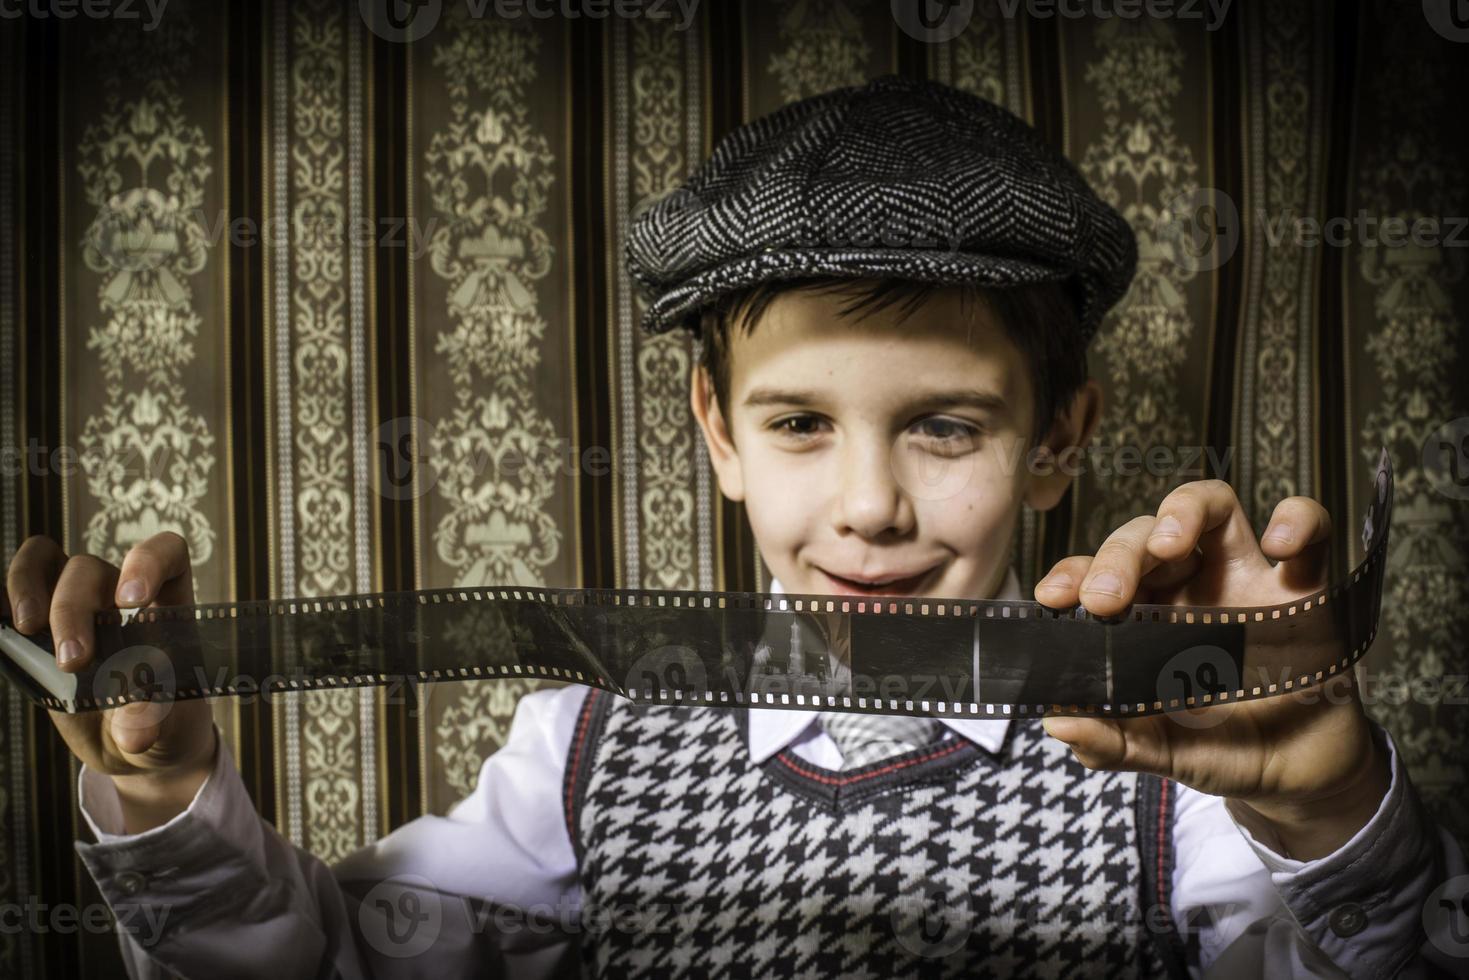 Child considered analog photographic film photo